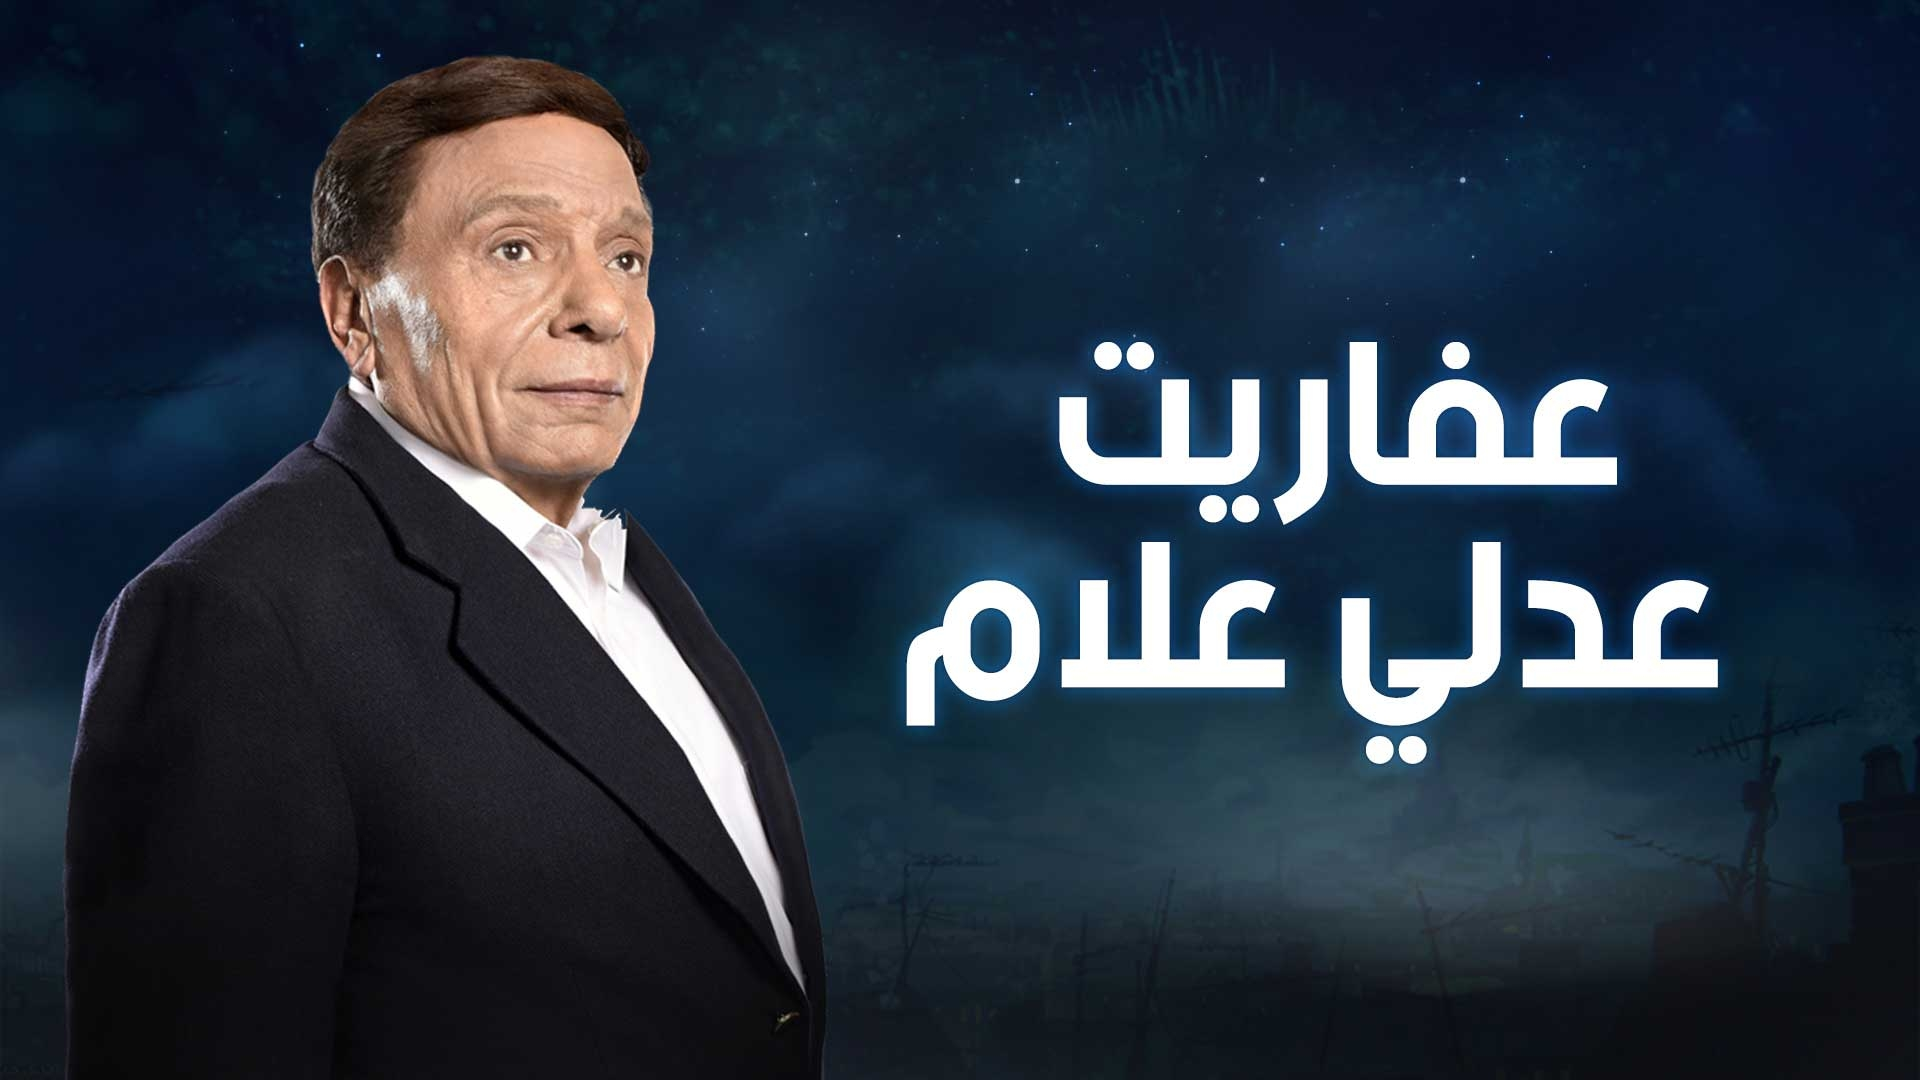 3afareet 3adly 3alam عفاريت عدلي علام